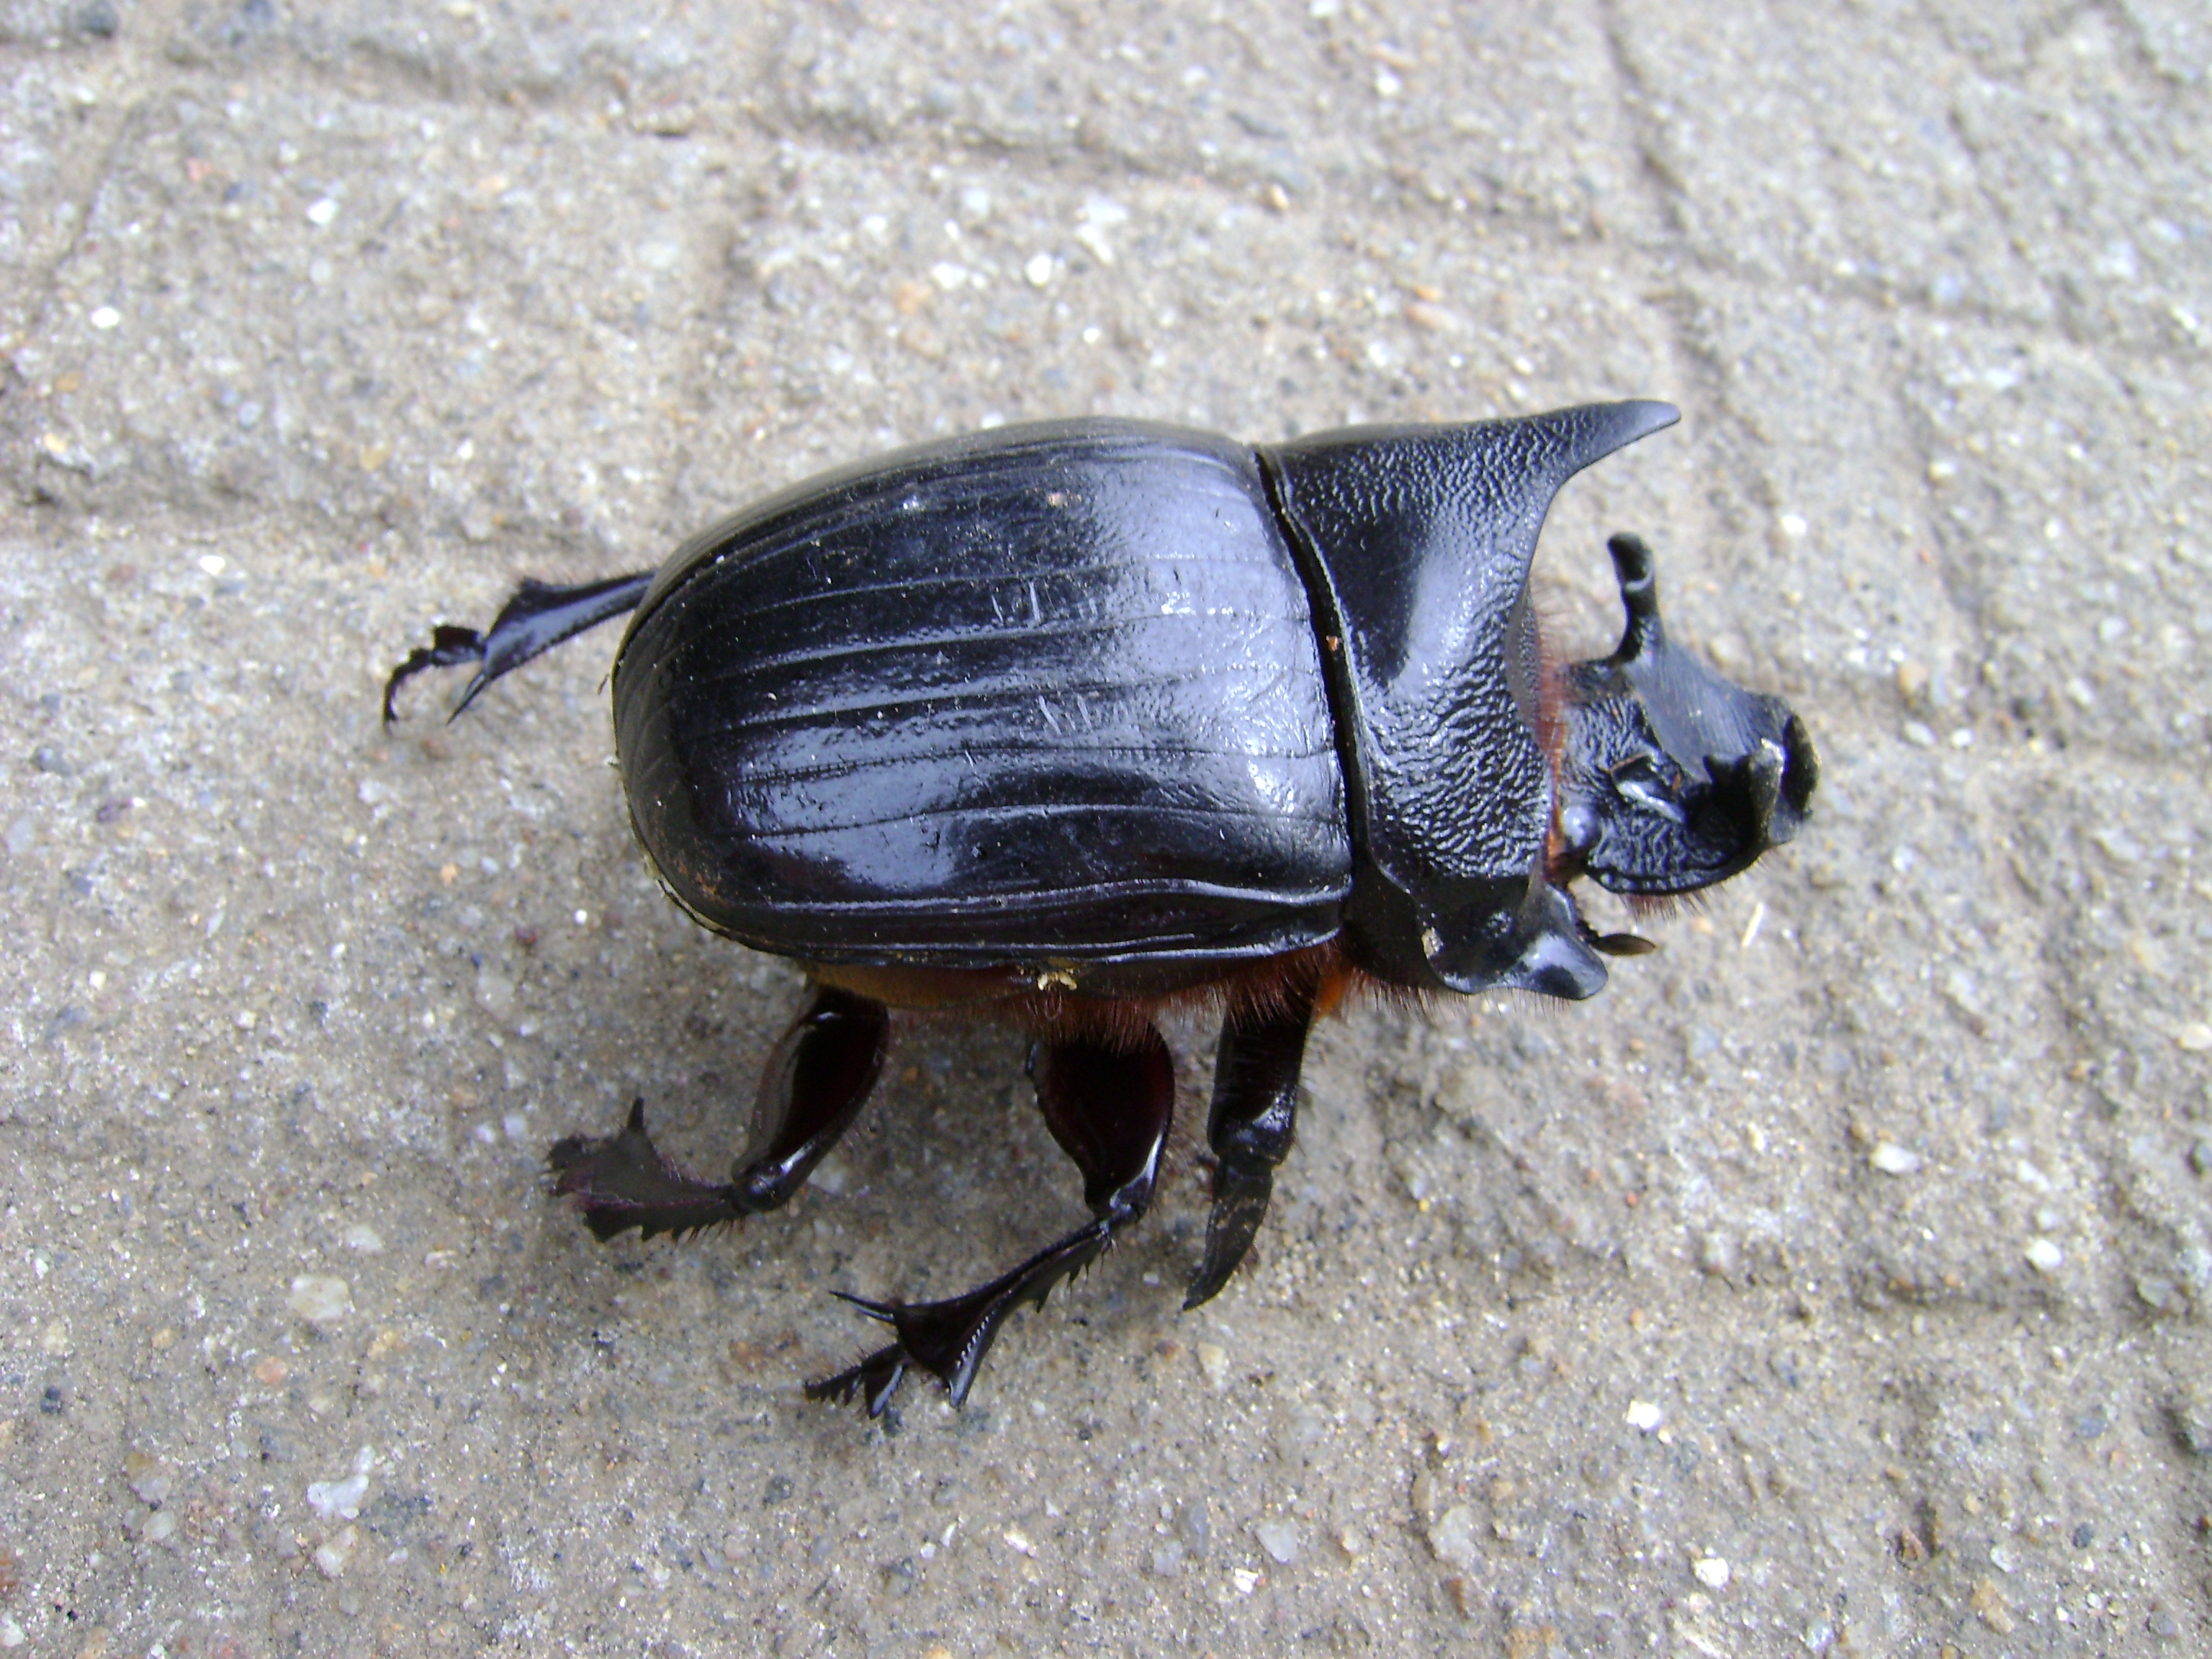 Filelarge beetle from keralag wikimedia commons filelarge beetle from keralag sciox Images